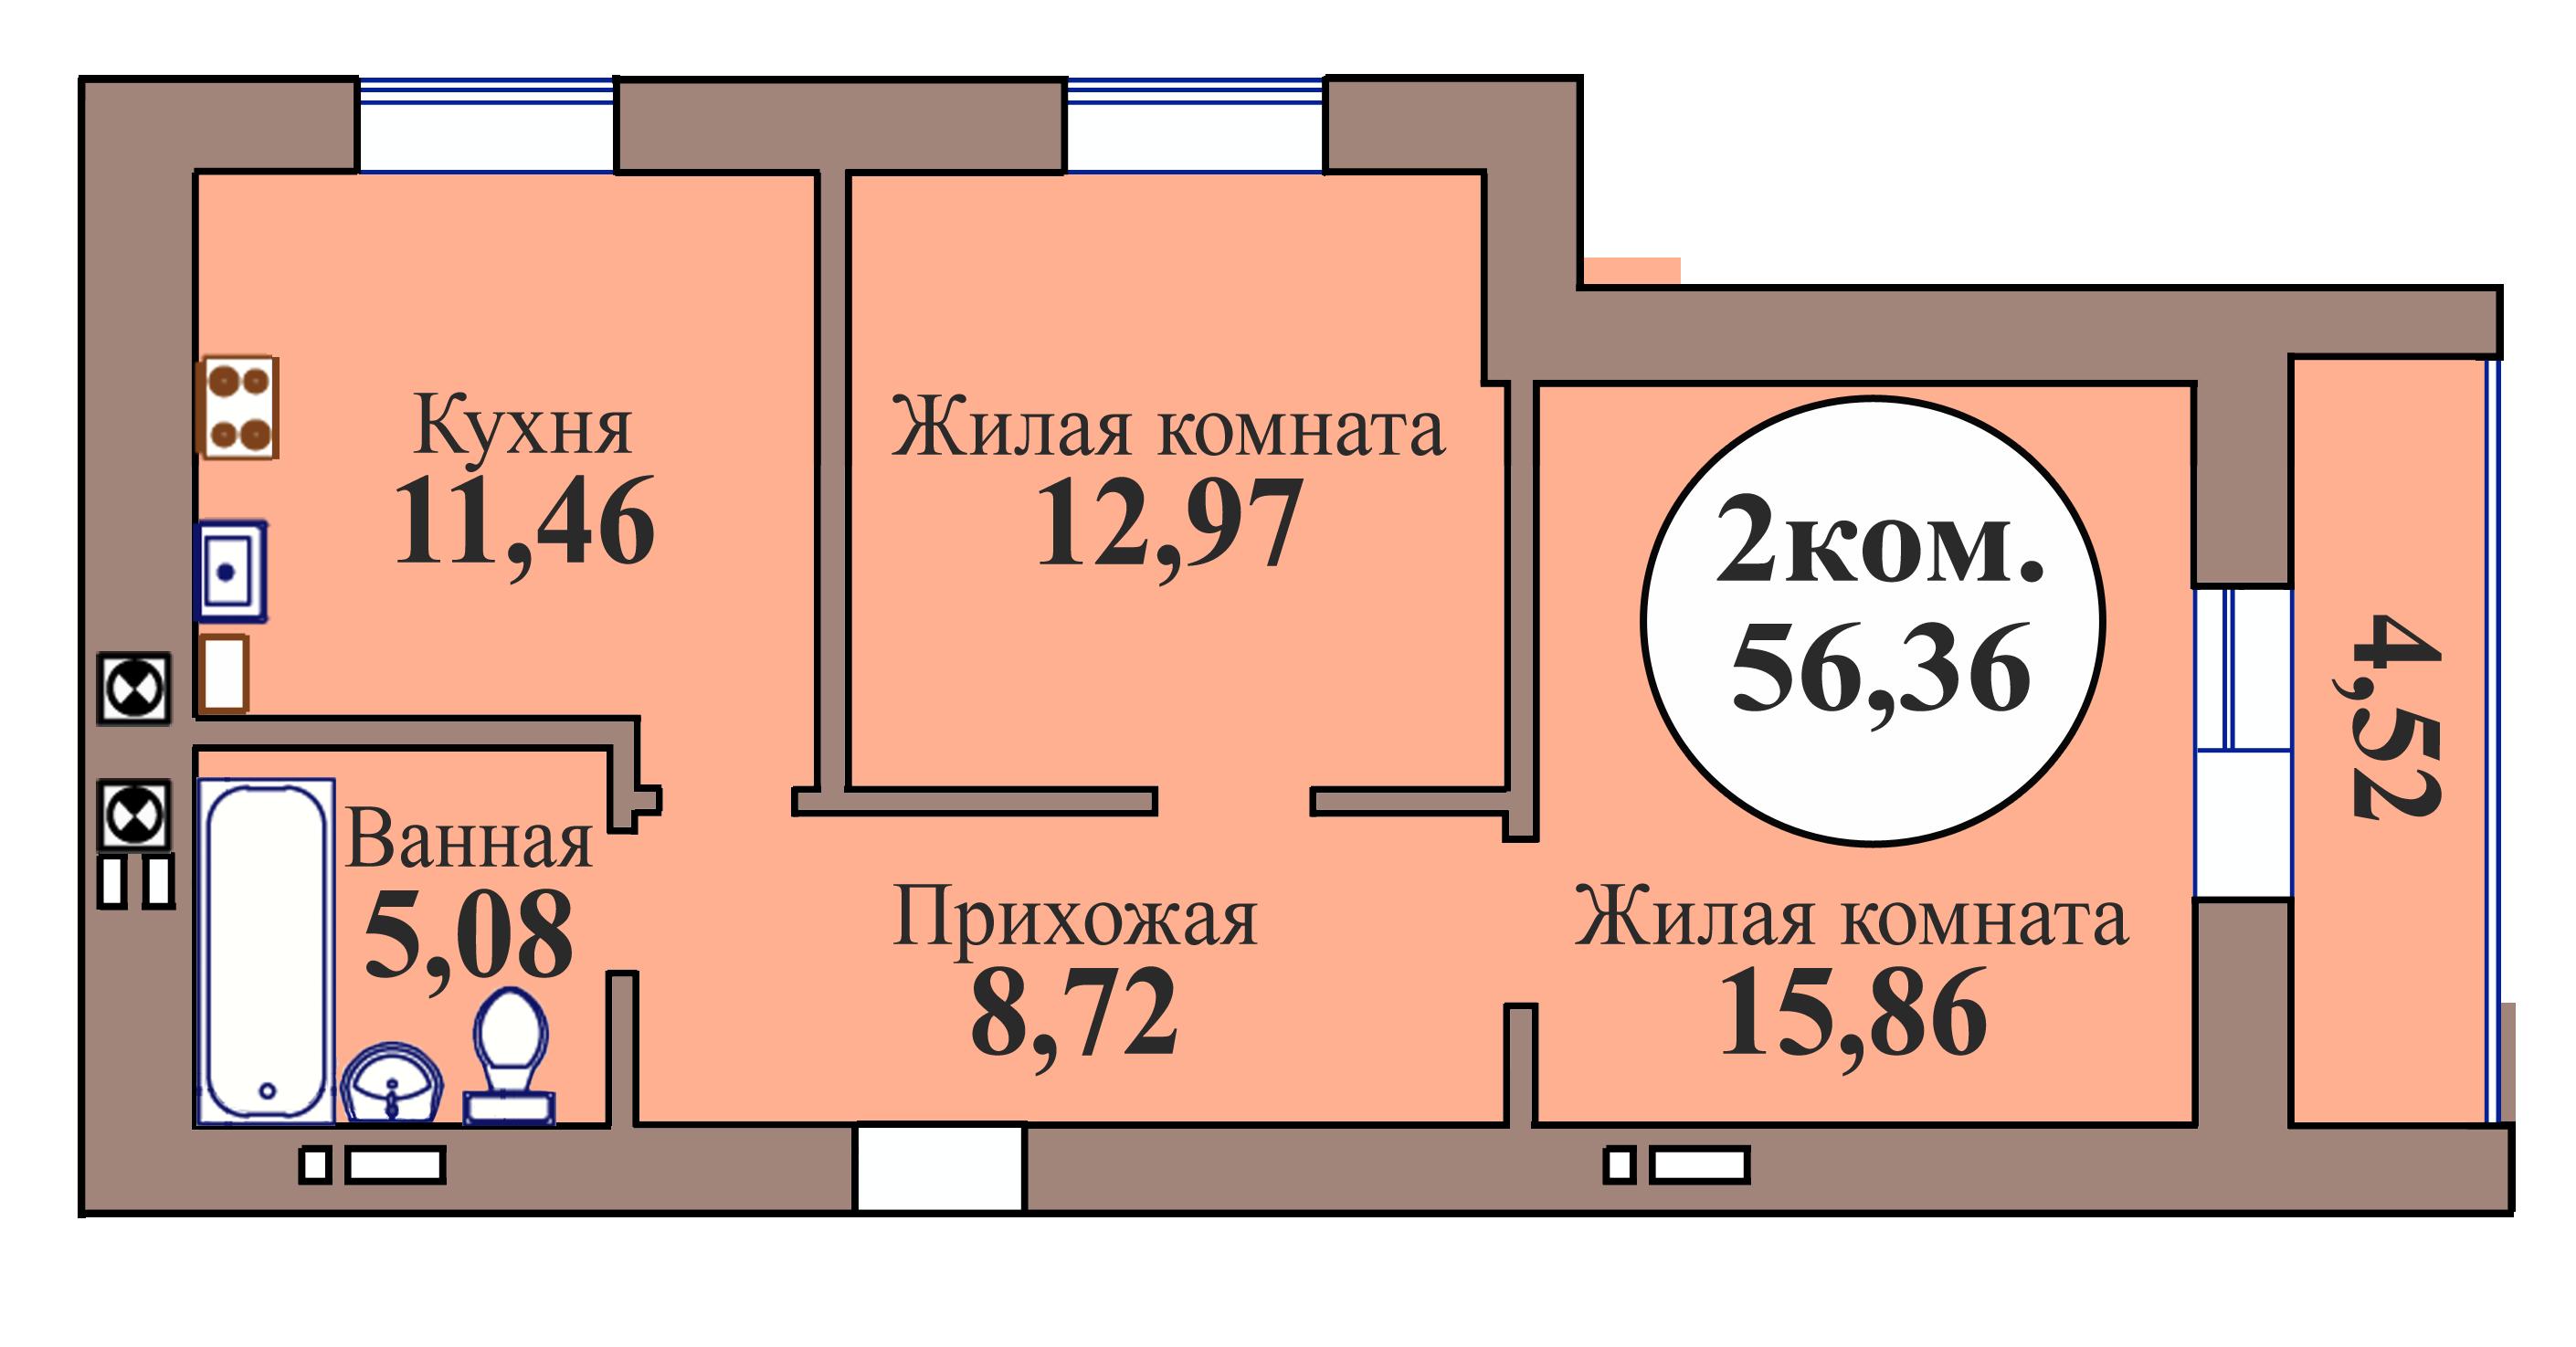 2-комн. кв. по пер. Калининградский, 5 кв. 104 в Калининграде